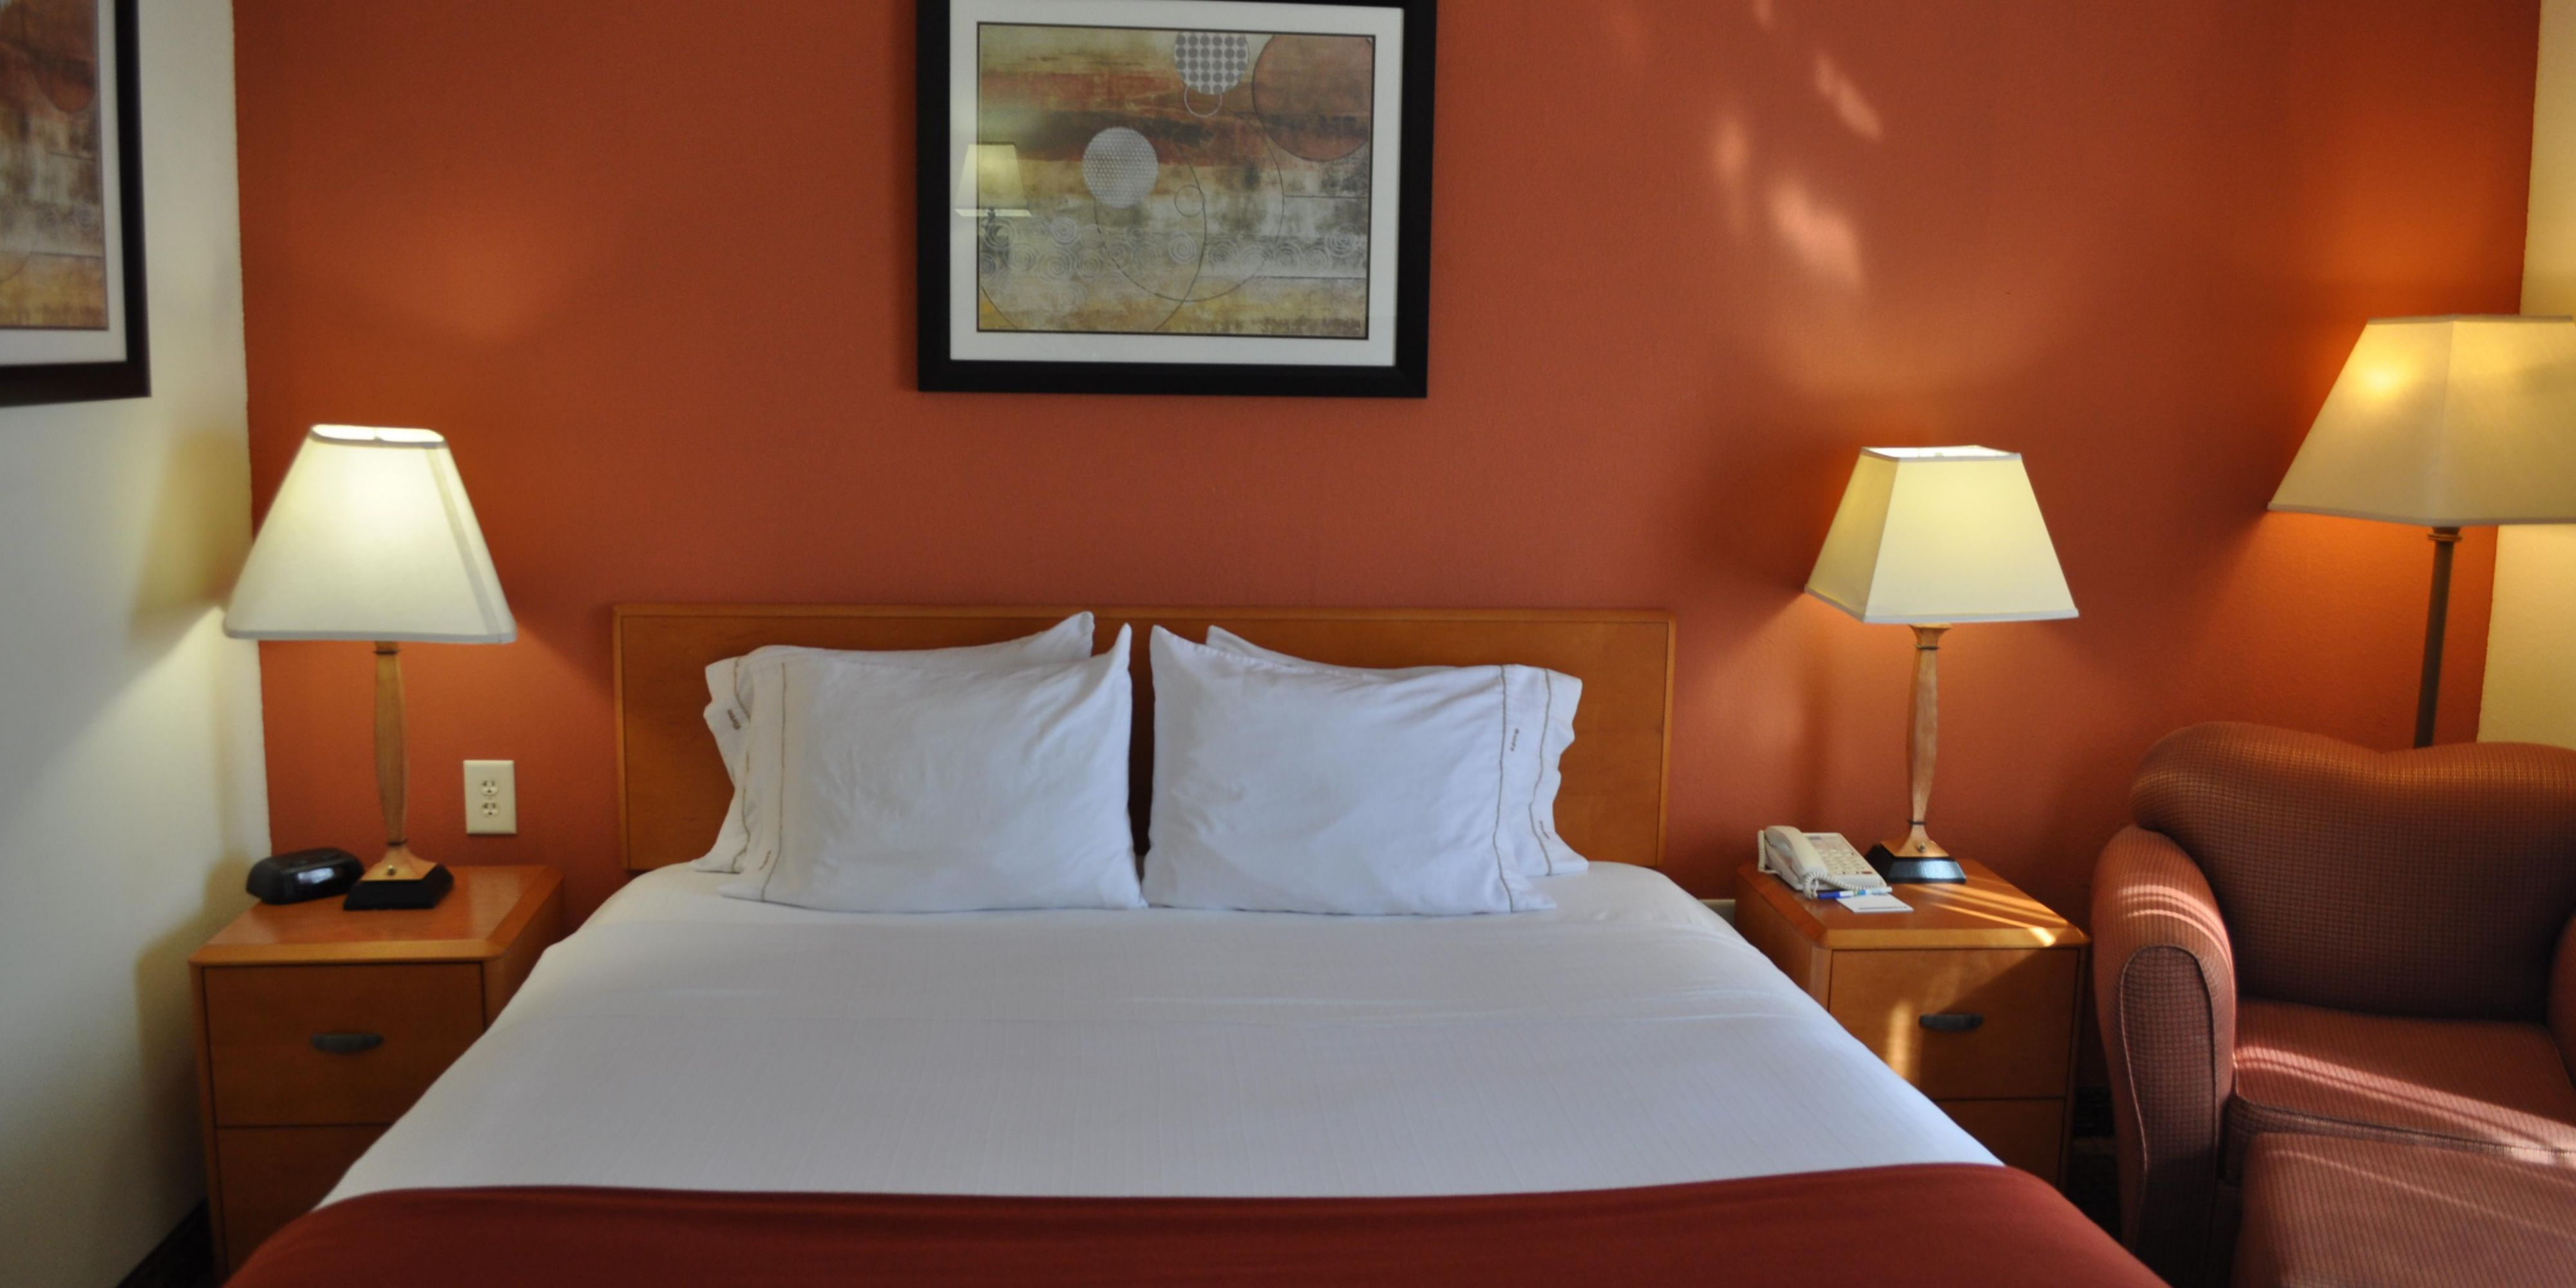 Holiday Inn Express Williamston 2533189249 2x1